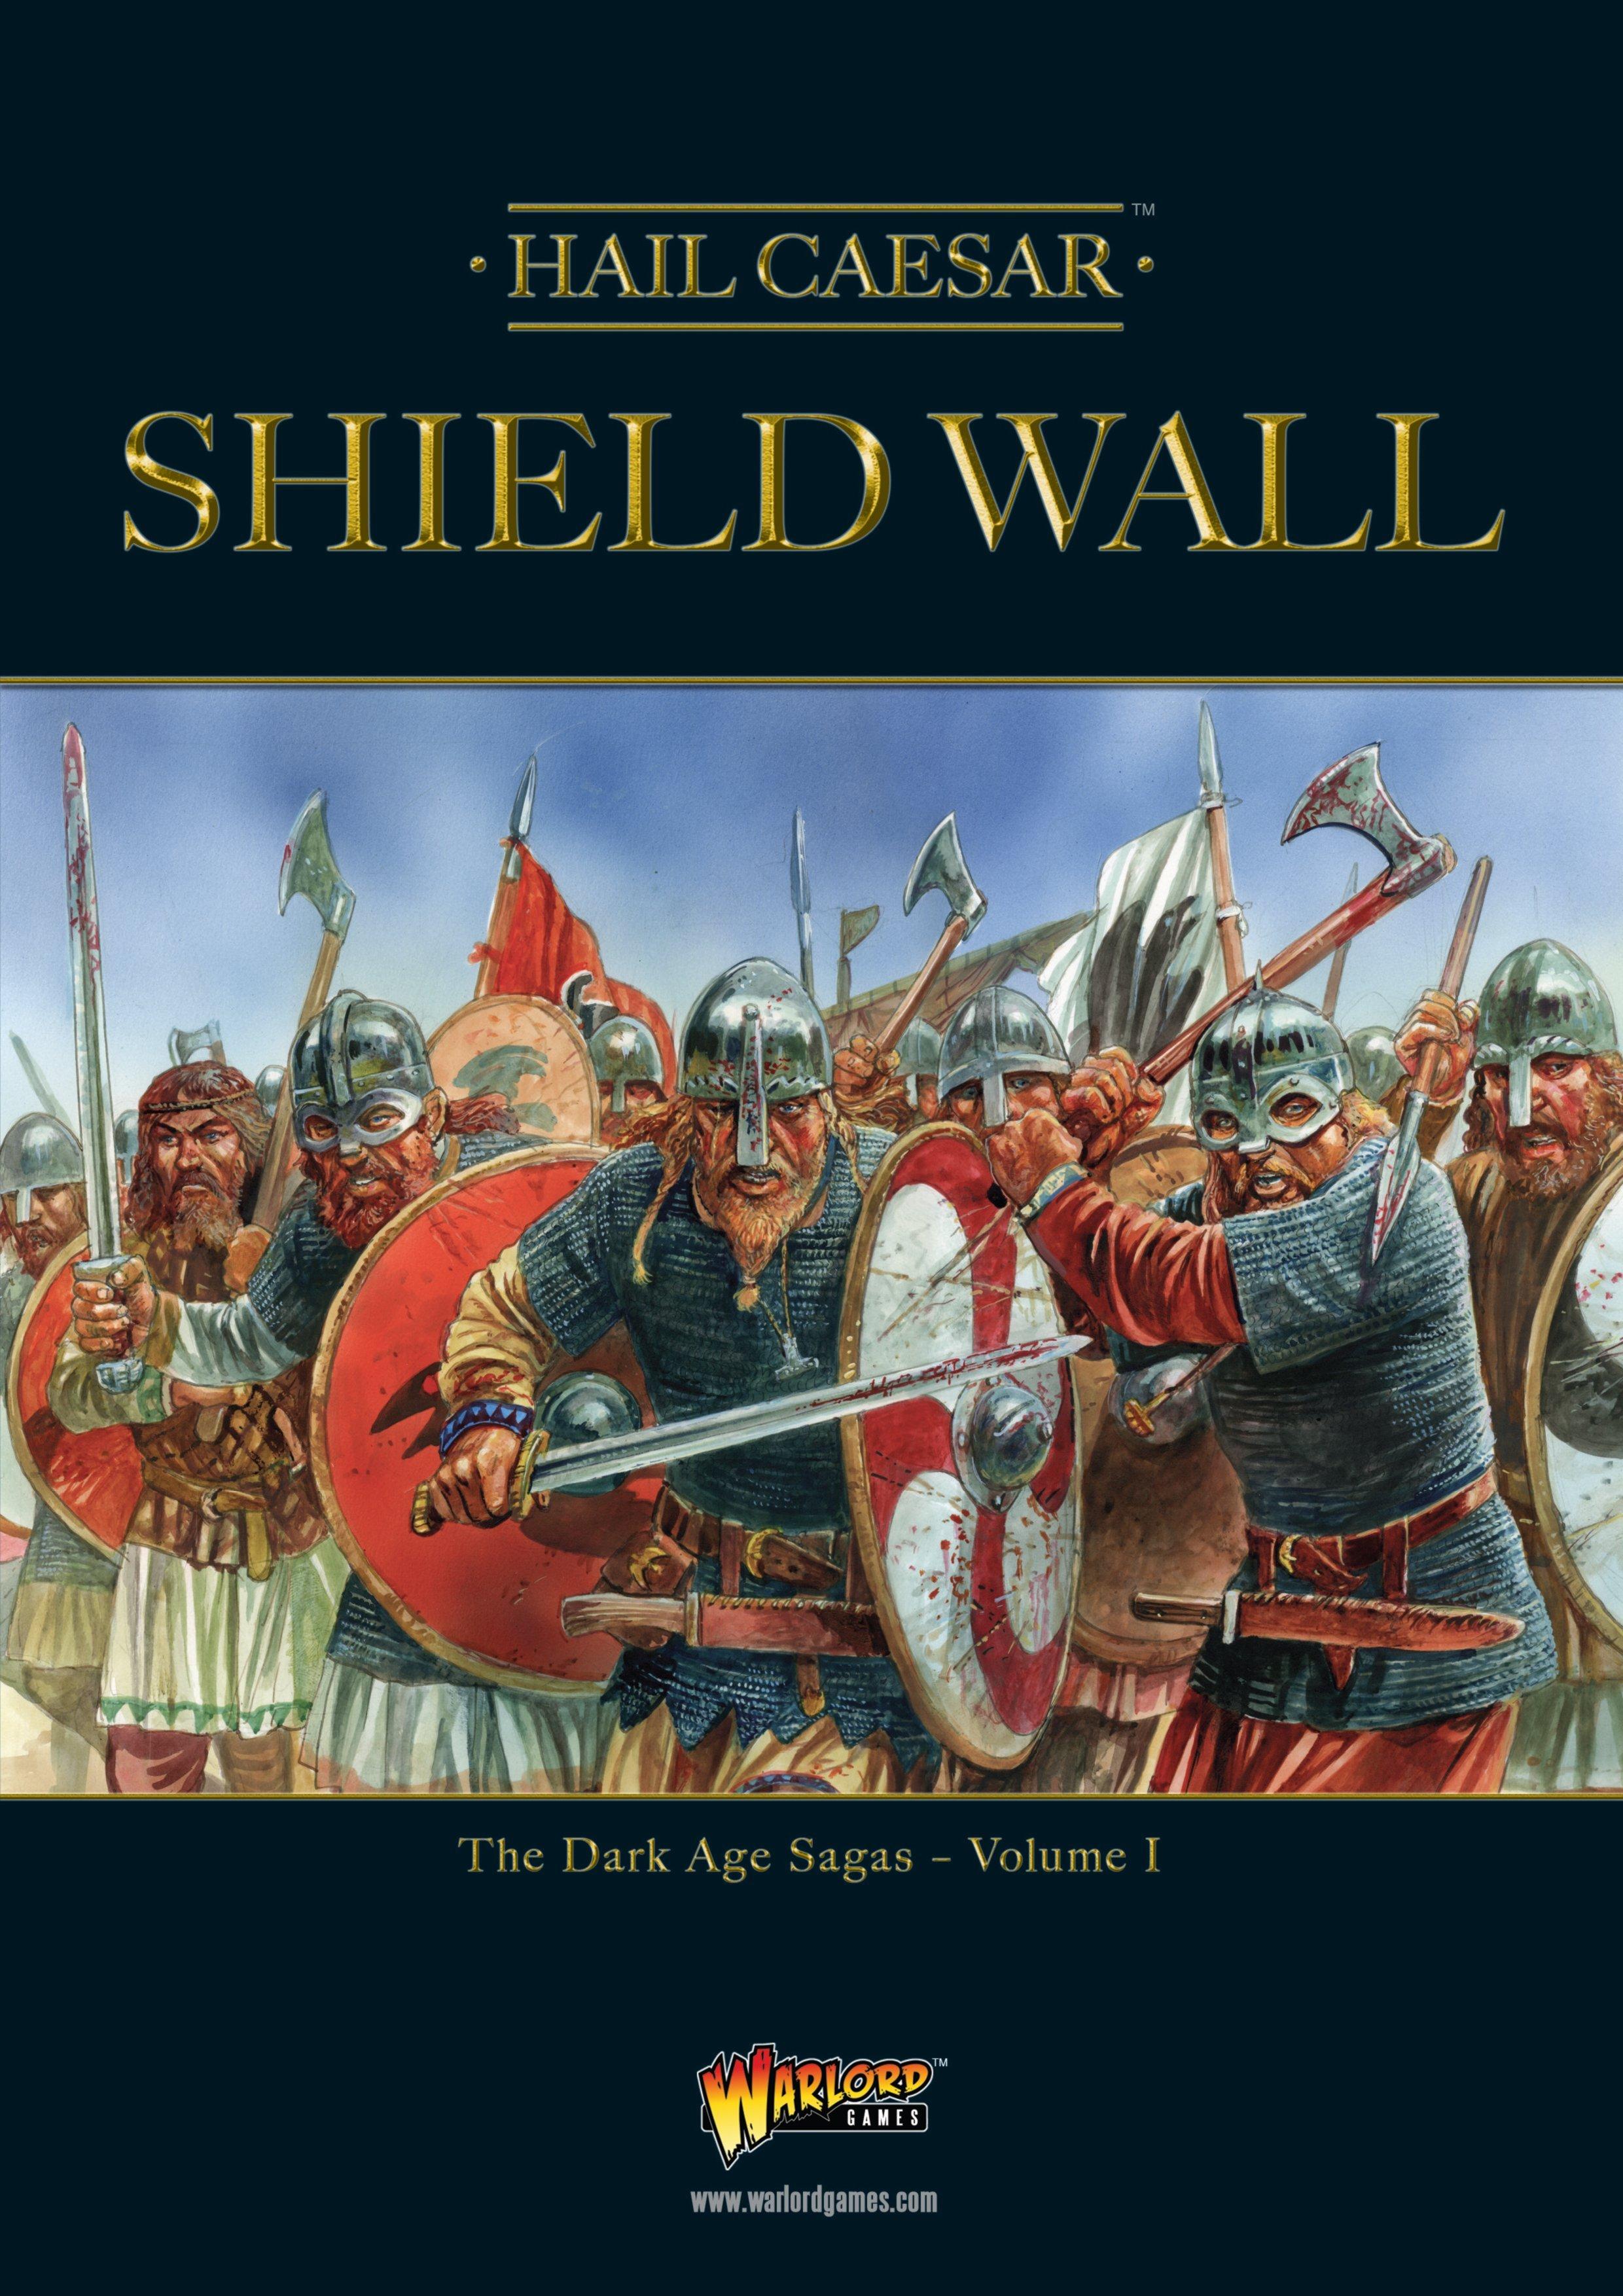 HC - Shield wall (book)